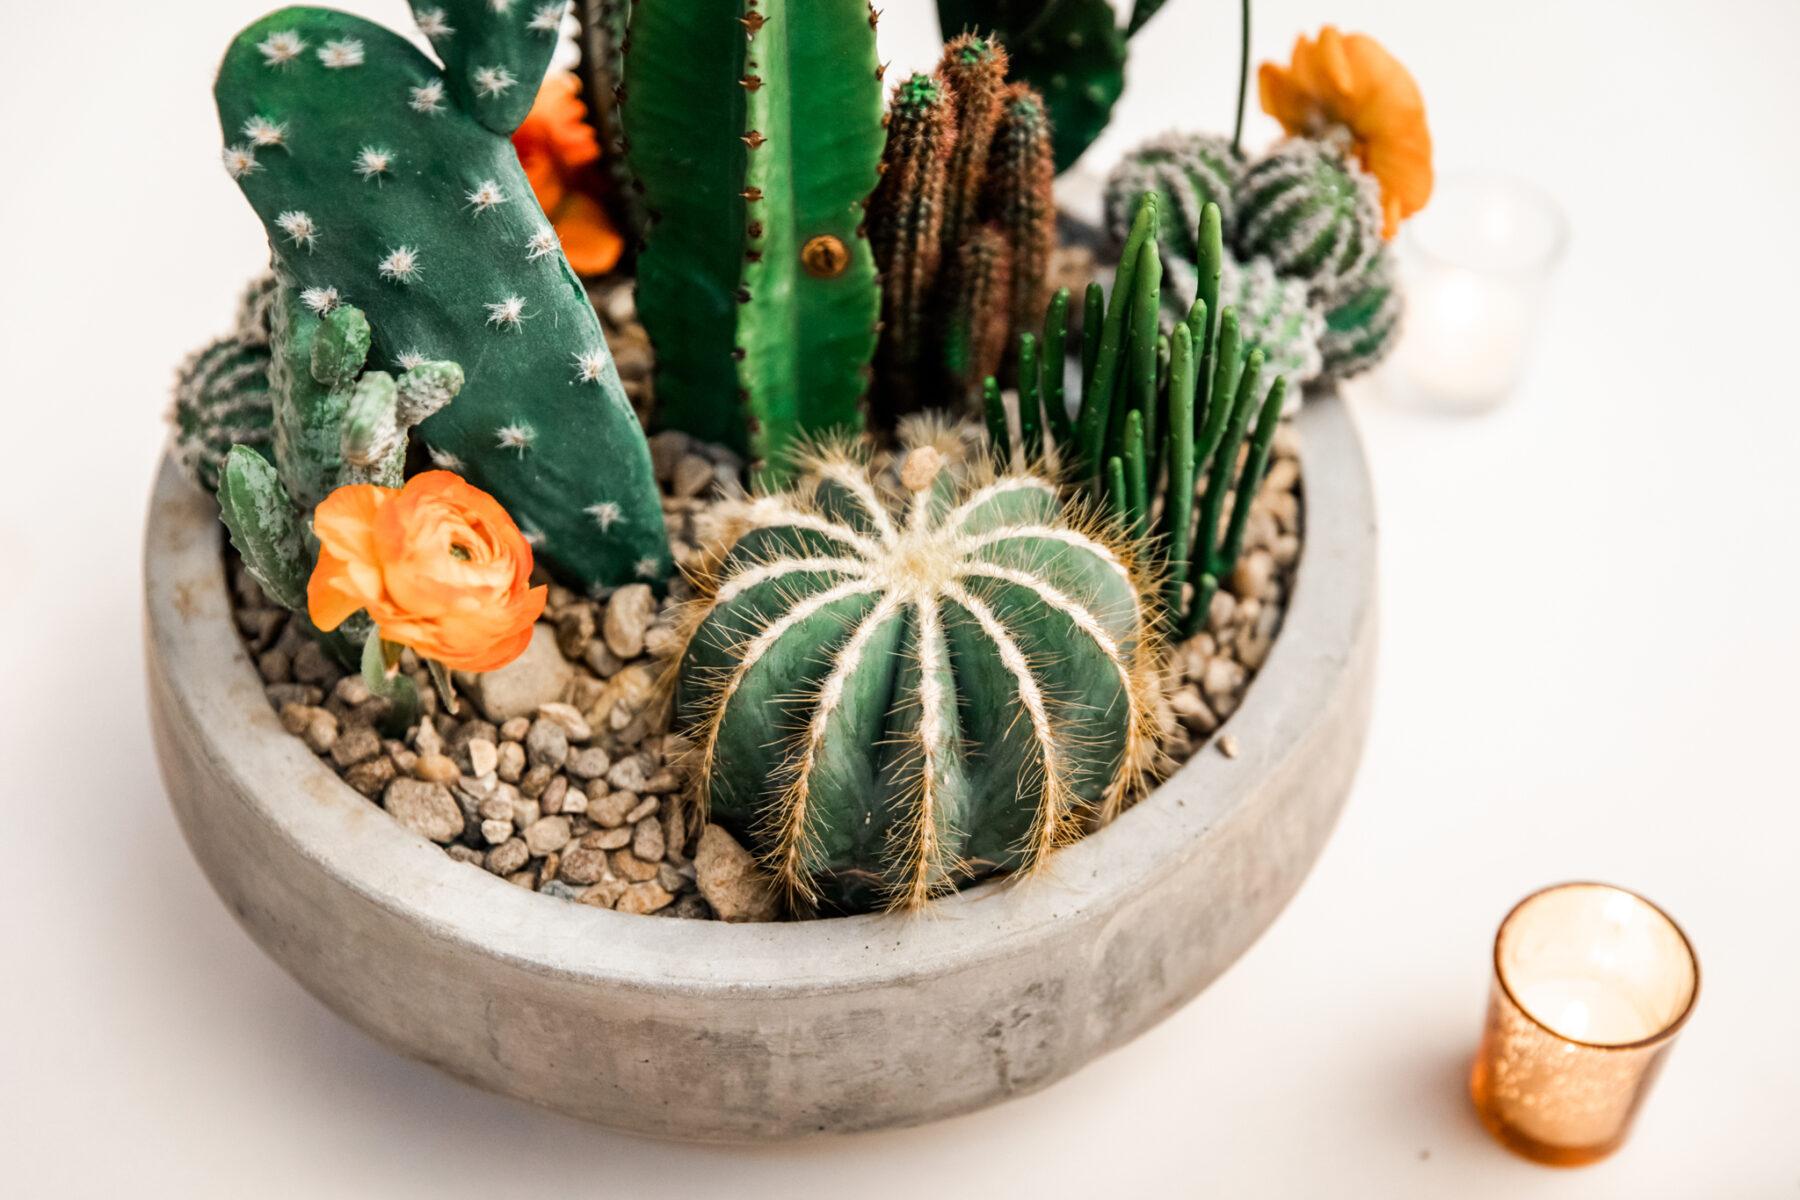 Cactus wedding centerpieces: Desert Wedding Ideas featured on Nashville Bride Guide